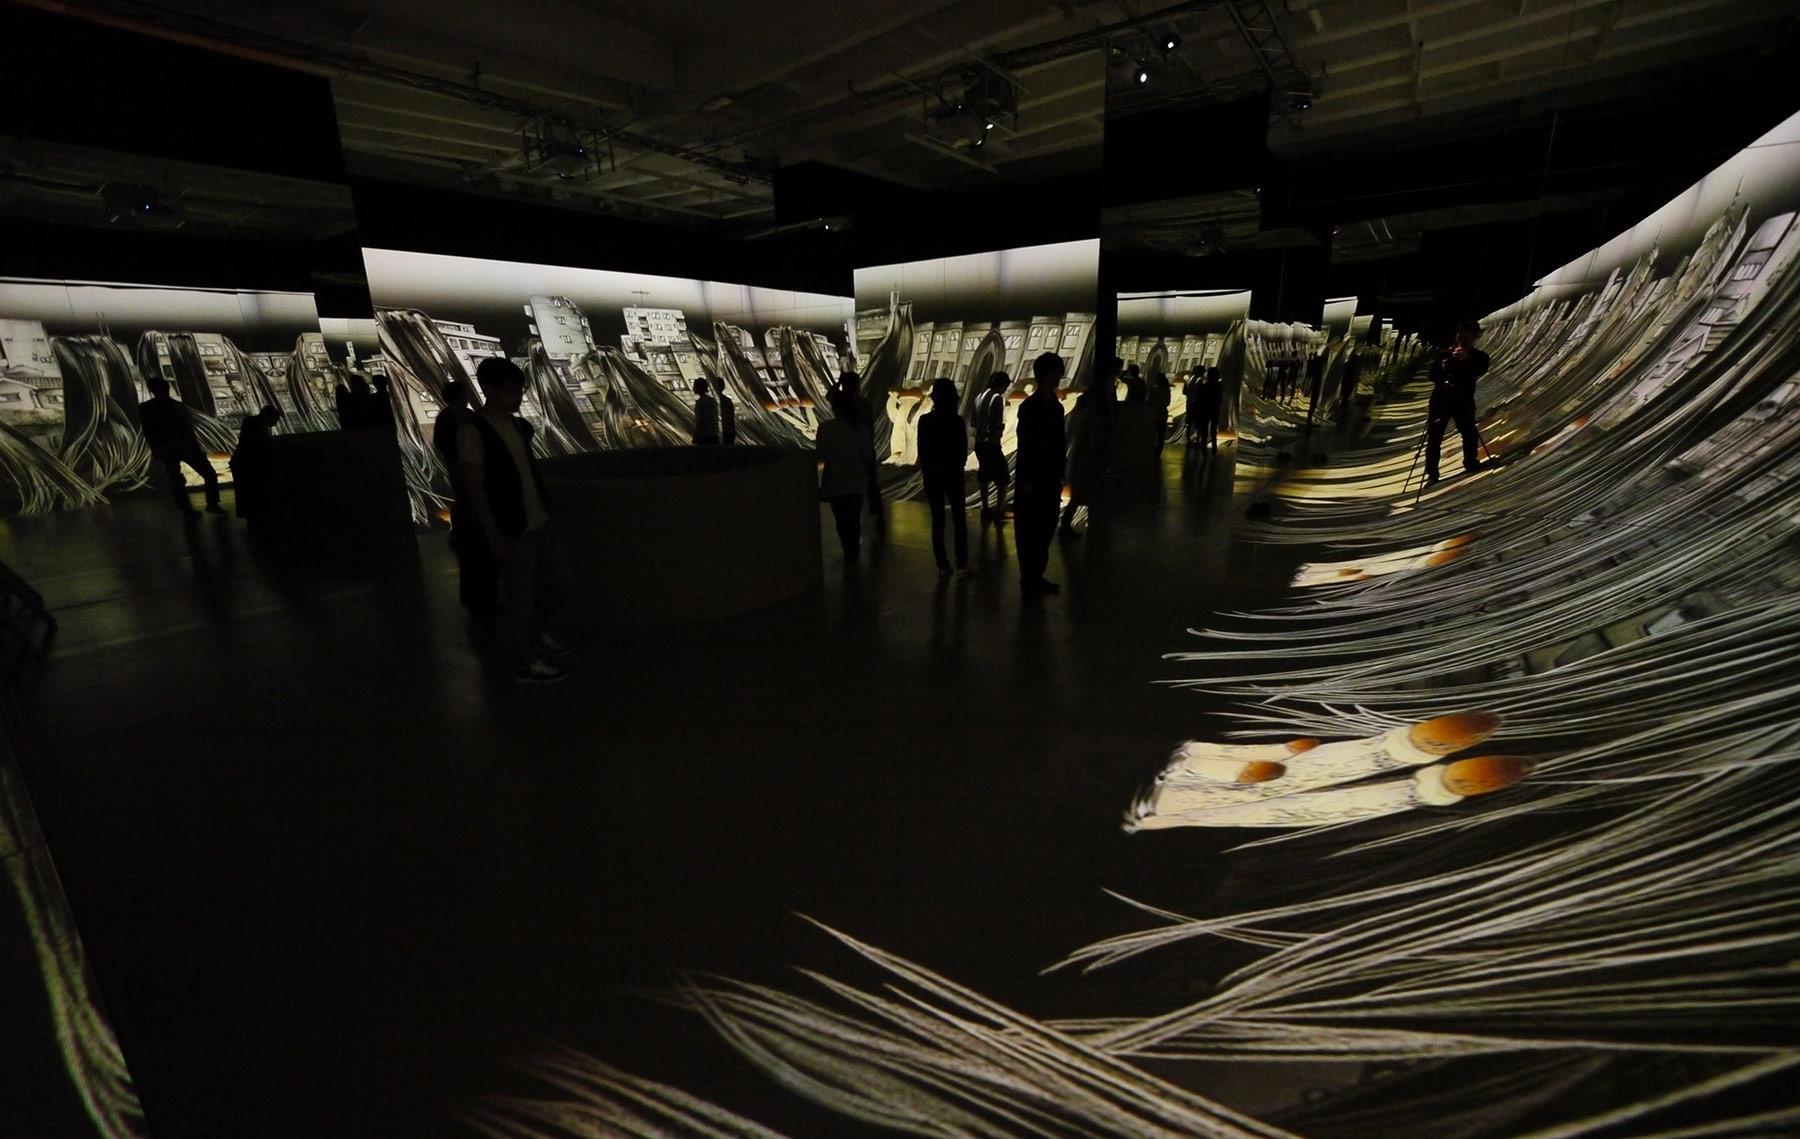 ©︎Tabaimo Courtesy of Gallery Koyanagi and James Cohan Gallery Photo by Ufer! Art Documentary